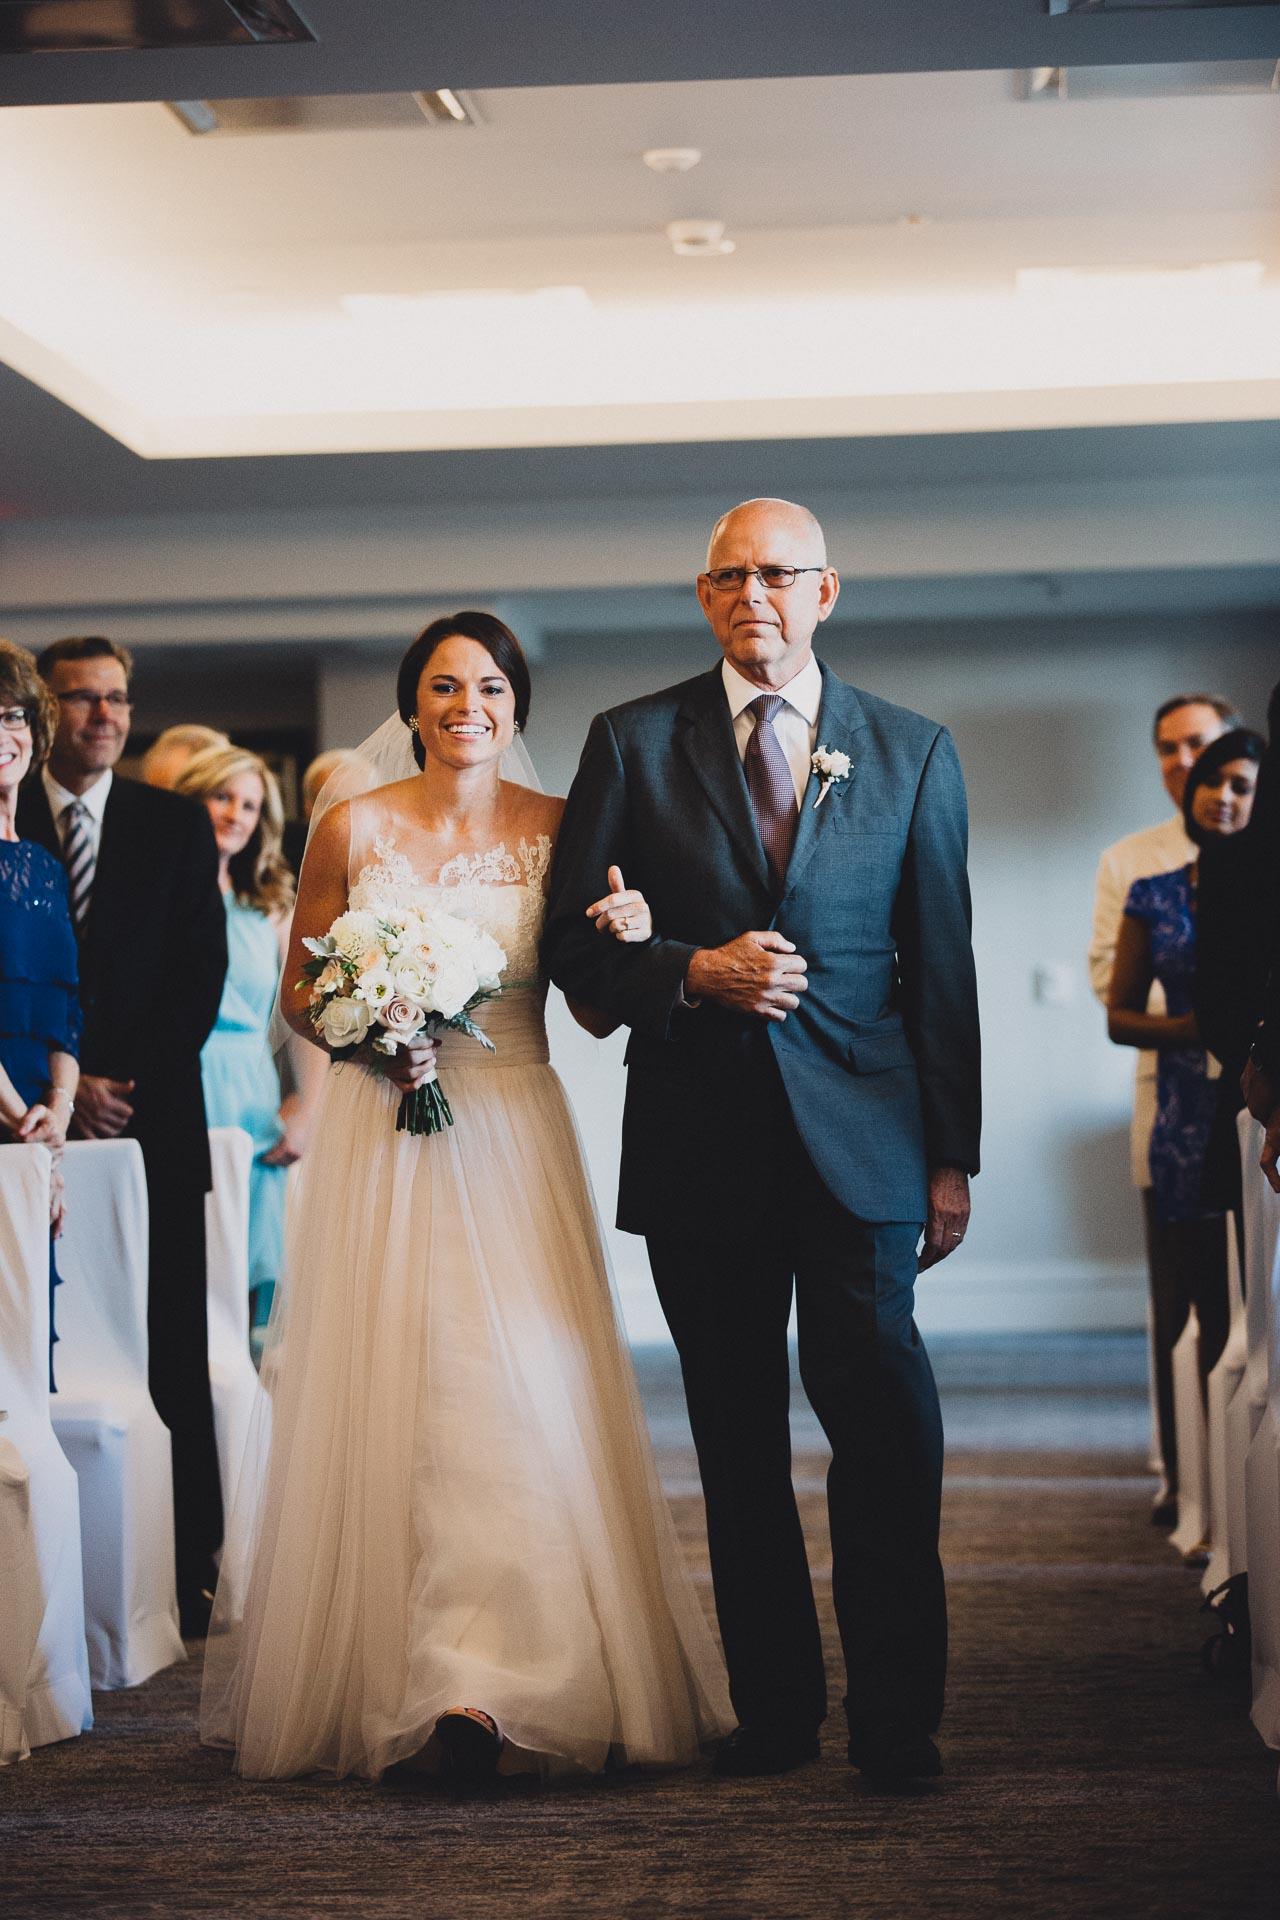 Emily-Eddie-Cincinnati-Rennaissance-Hotel-Wedding-080@2x.jpg